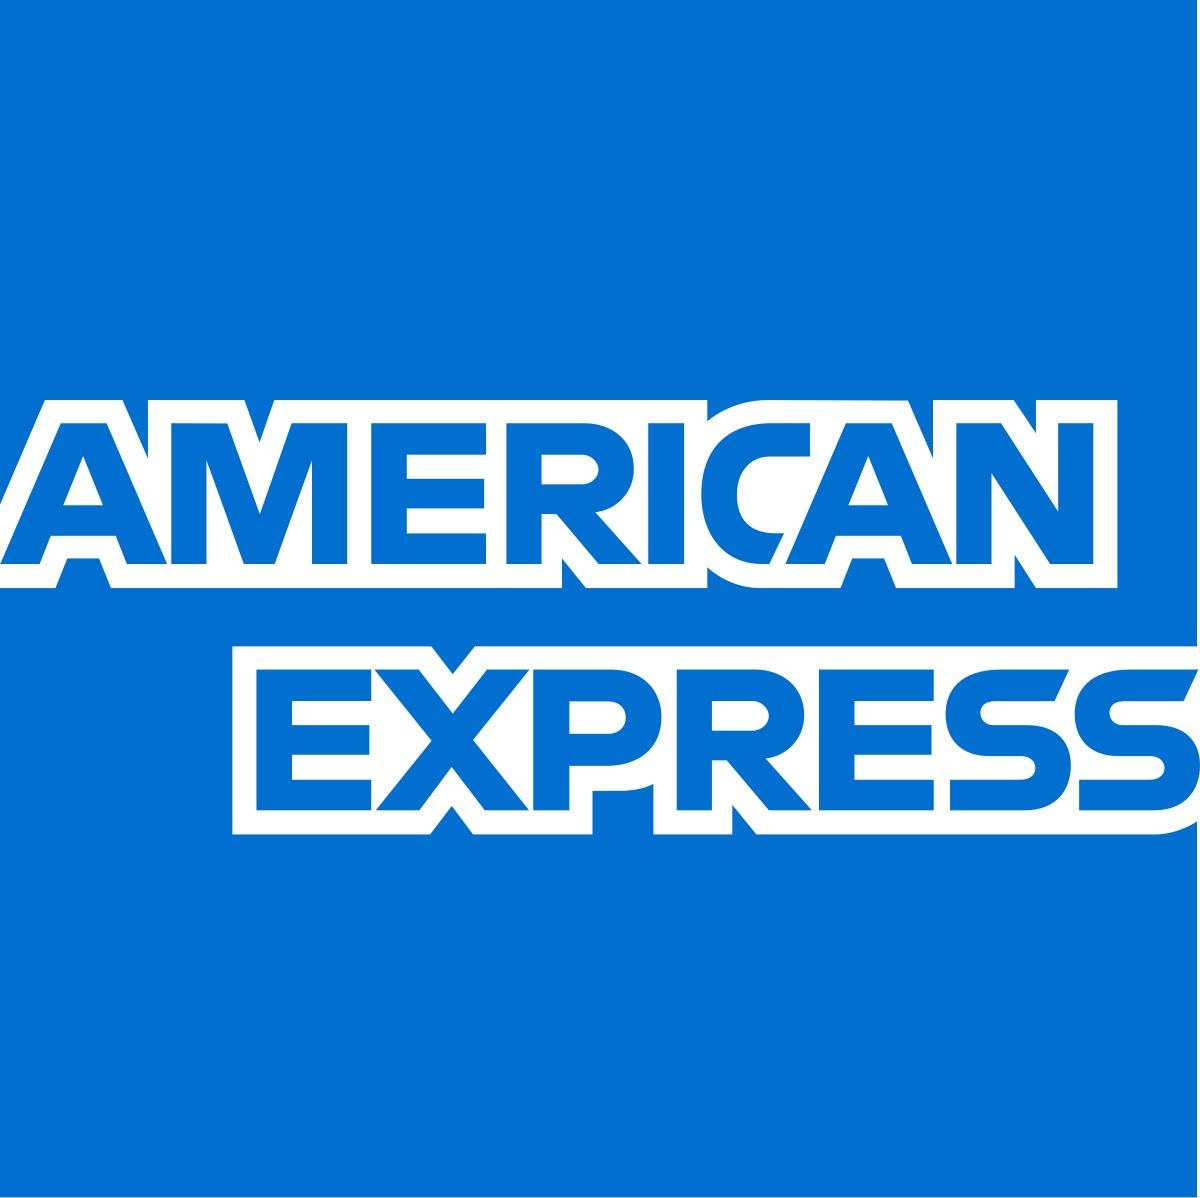 American Express Angebote & Deals ⇒ Januar 8 - mydealz